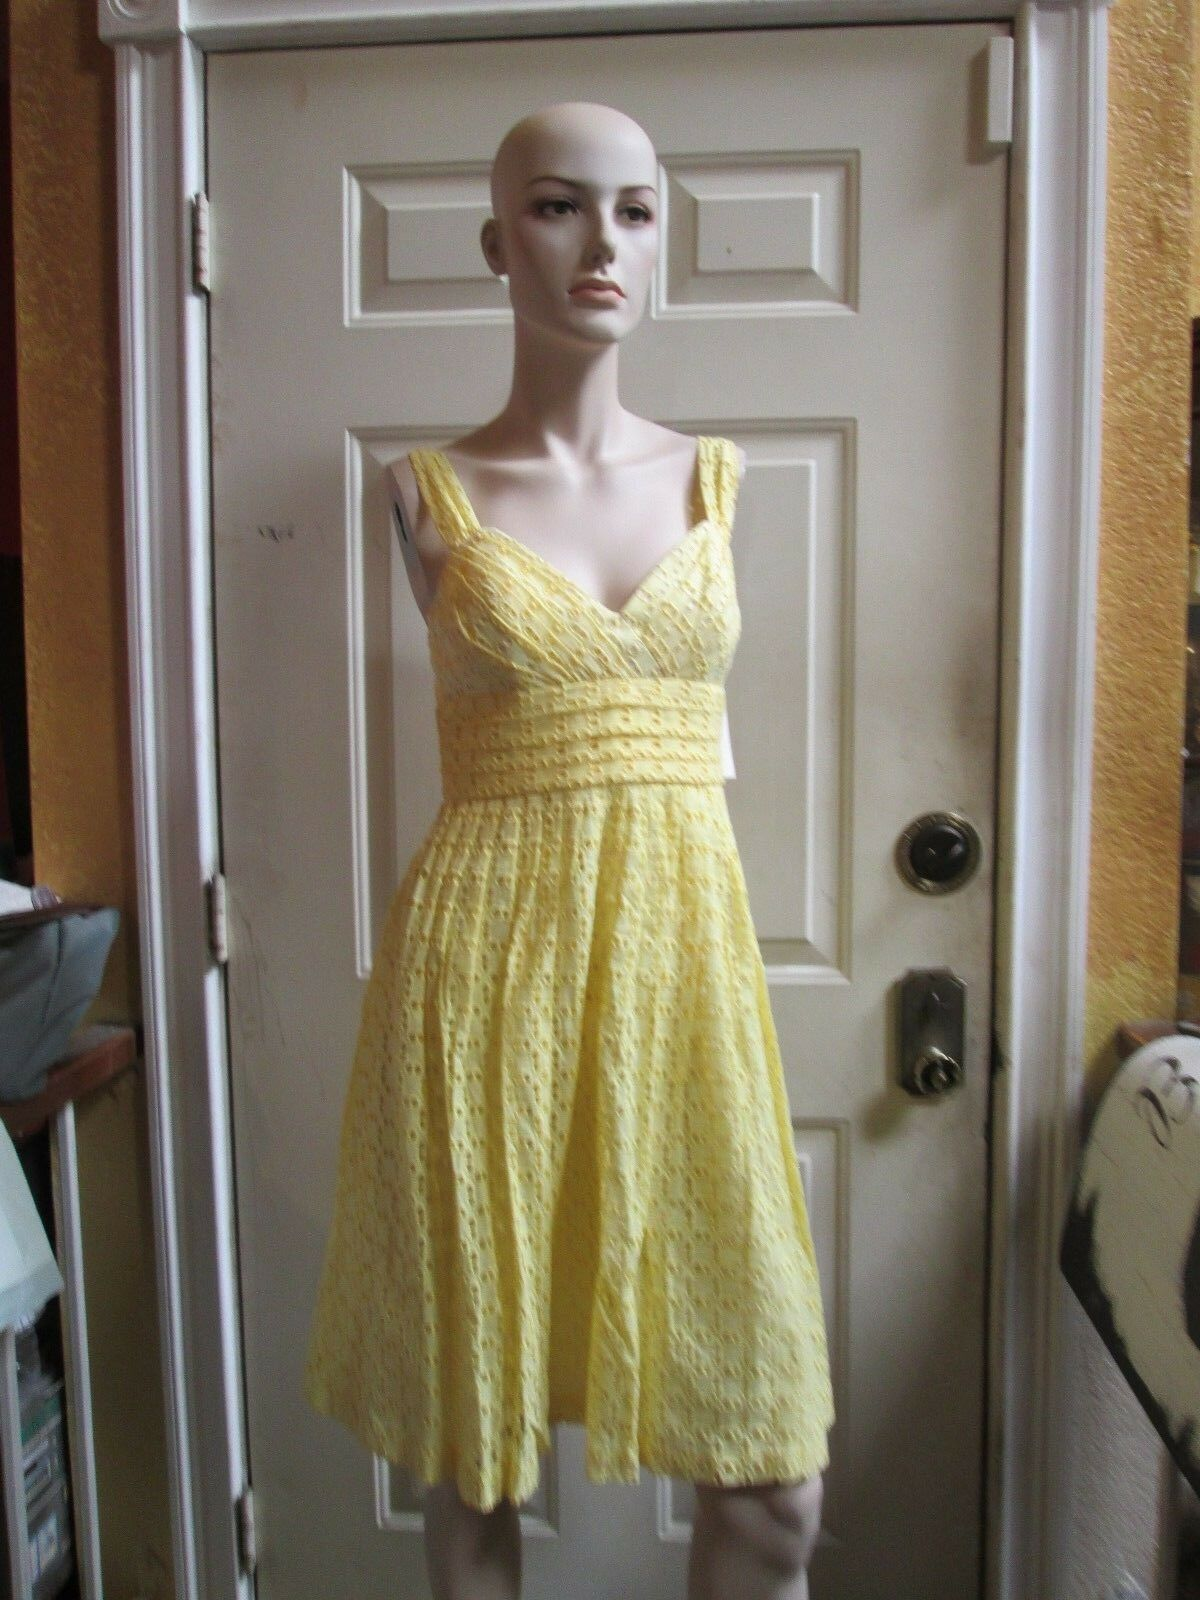 6996a96c Nwt SHOSHANNA Anhtropologie designer Yellow COTTON Eyelet sheath dress Sz 6